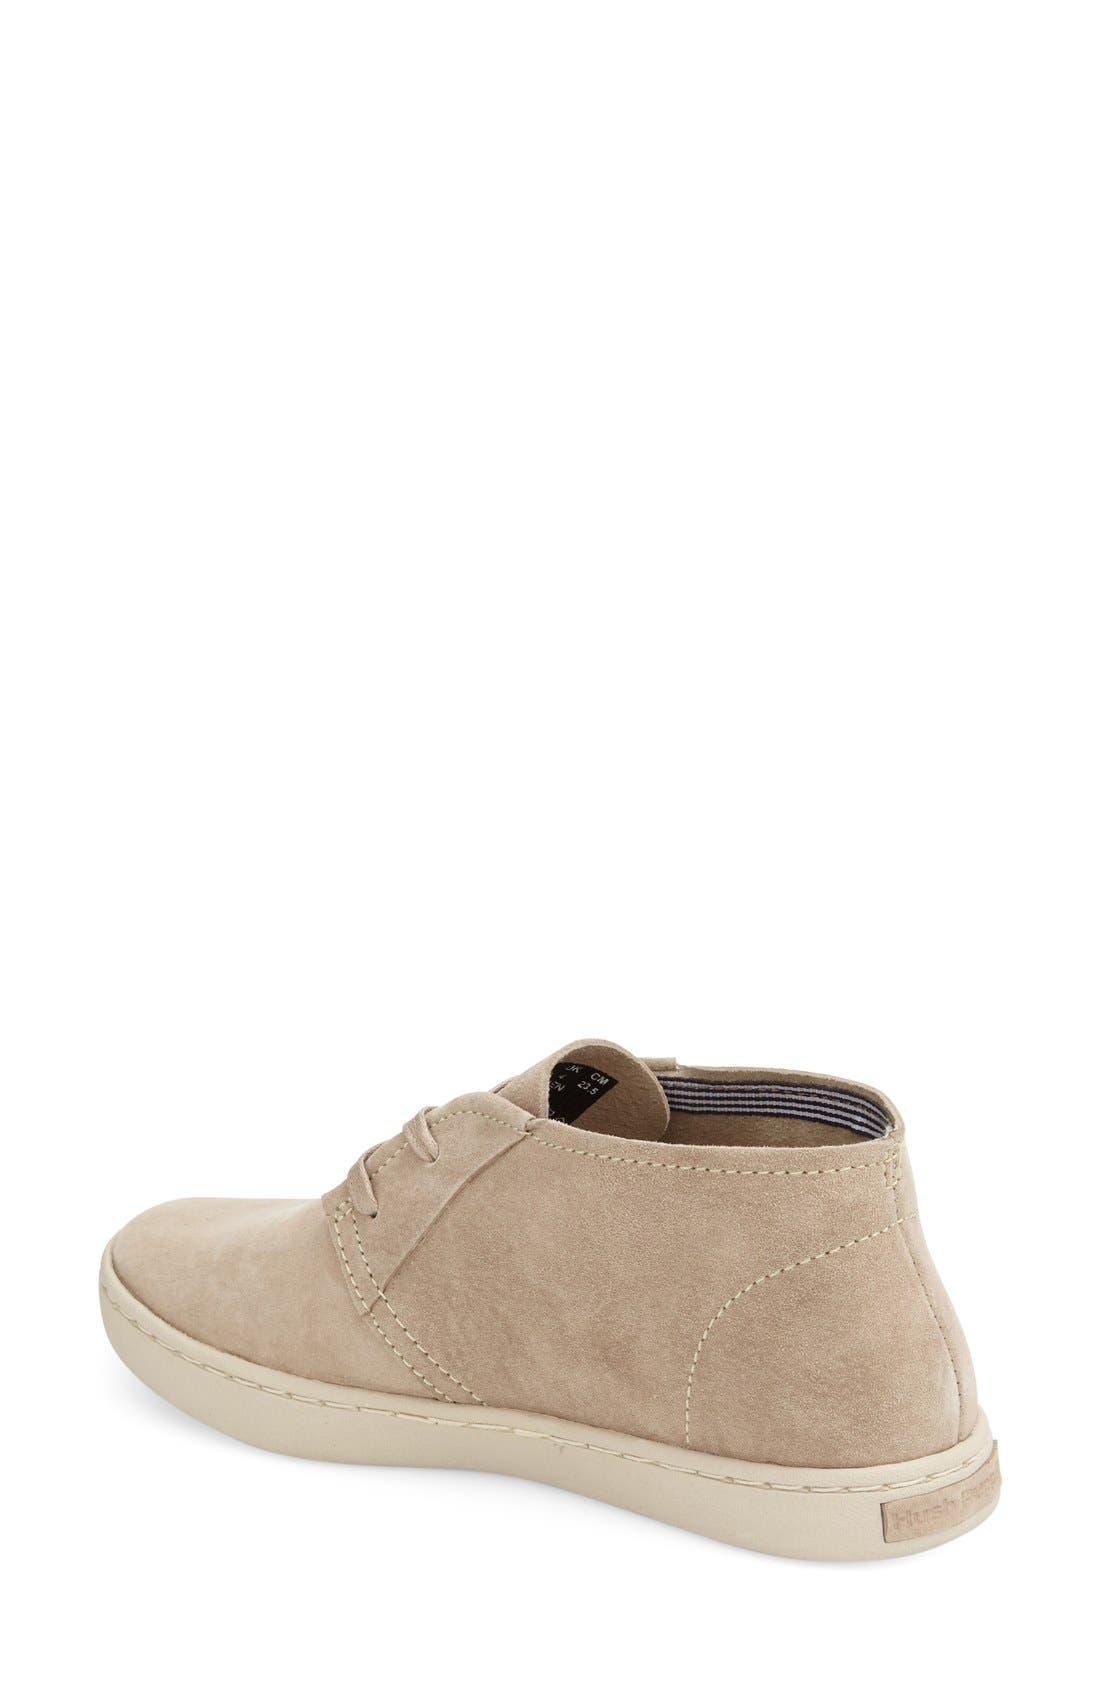 'Cille Gwen' Sneaker,                             Alternate thumbnail 9, color,